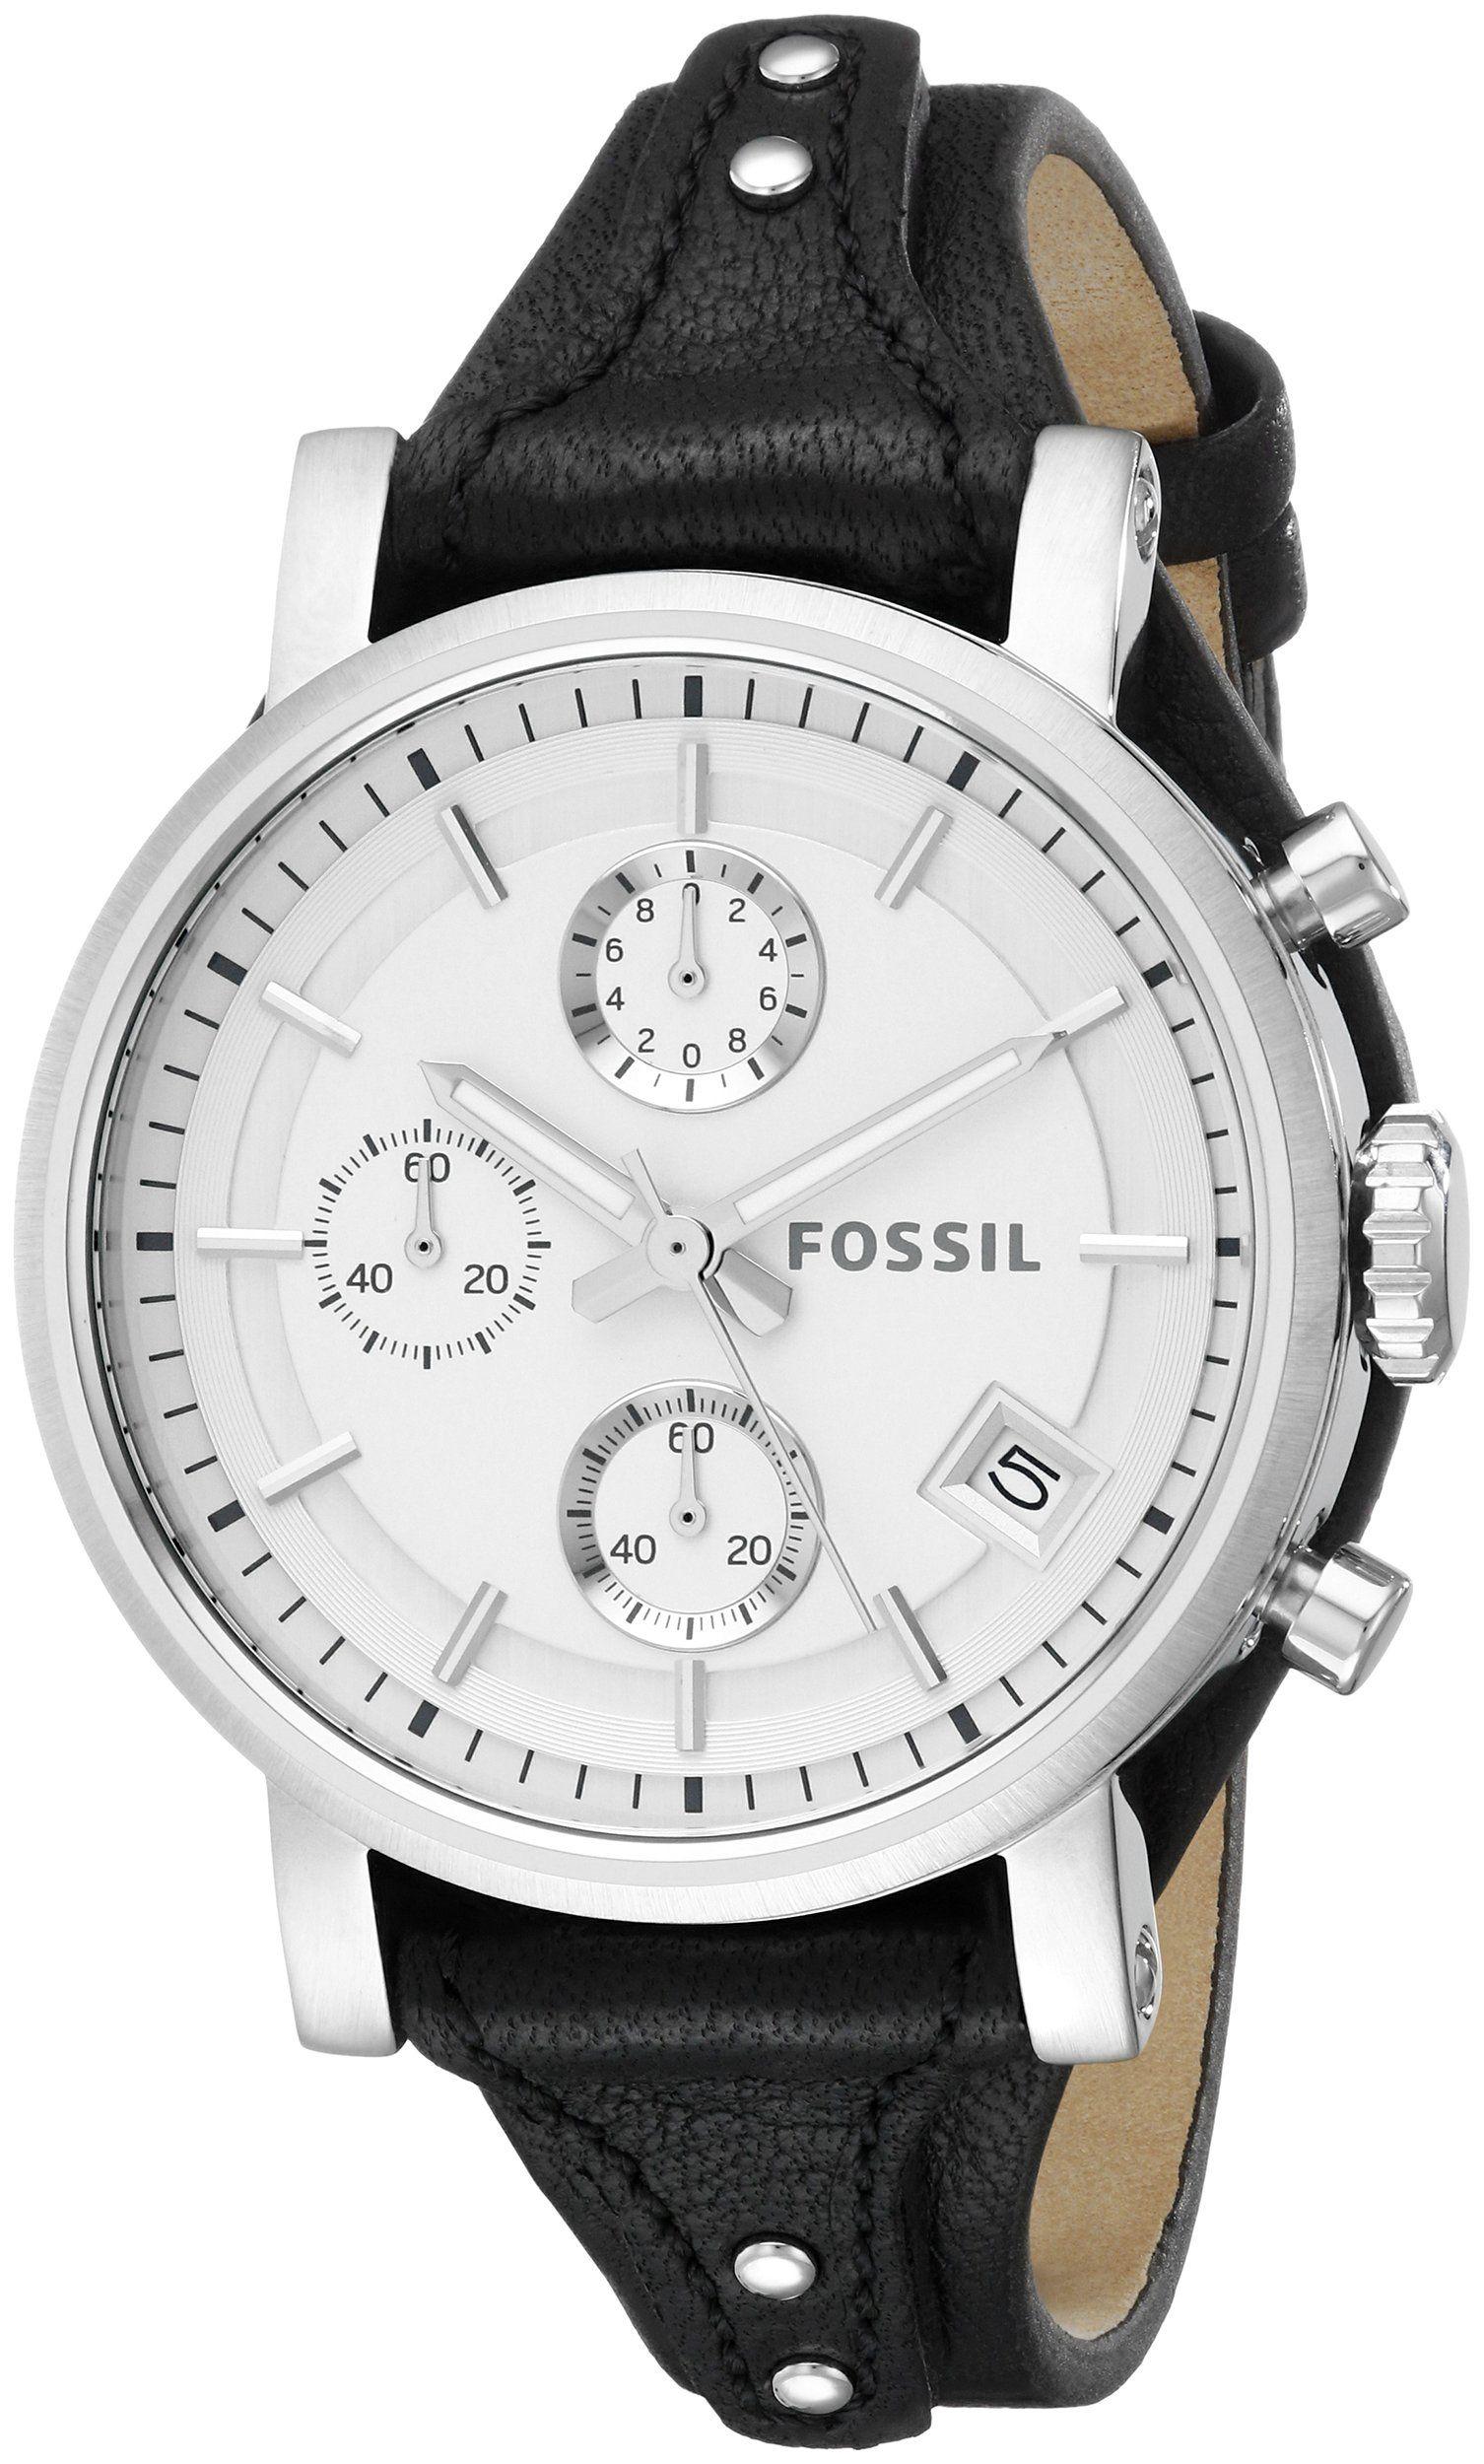 Amazon Com Fossil Women S Es3817 Original Boyfriend Analog Display Analog Quartz Black Watch Watches Fossil Watches Women Leather Watch Leather